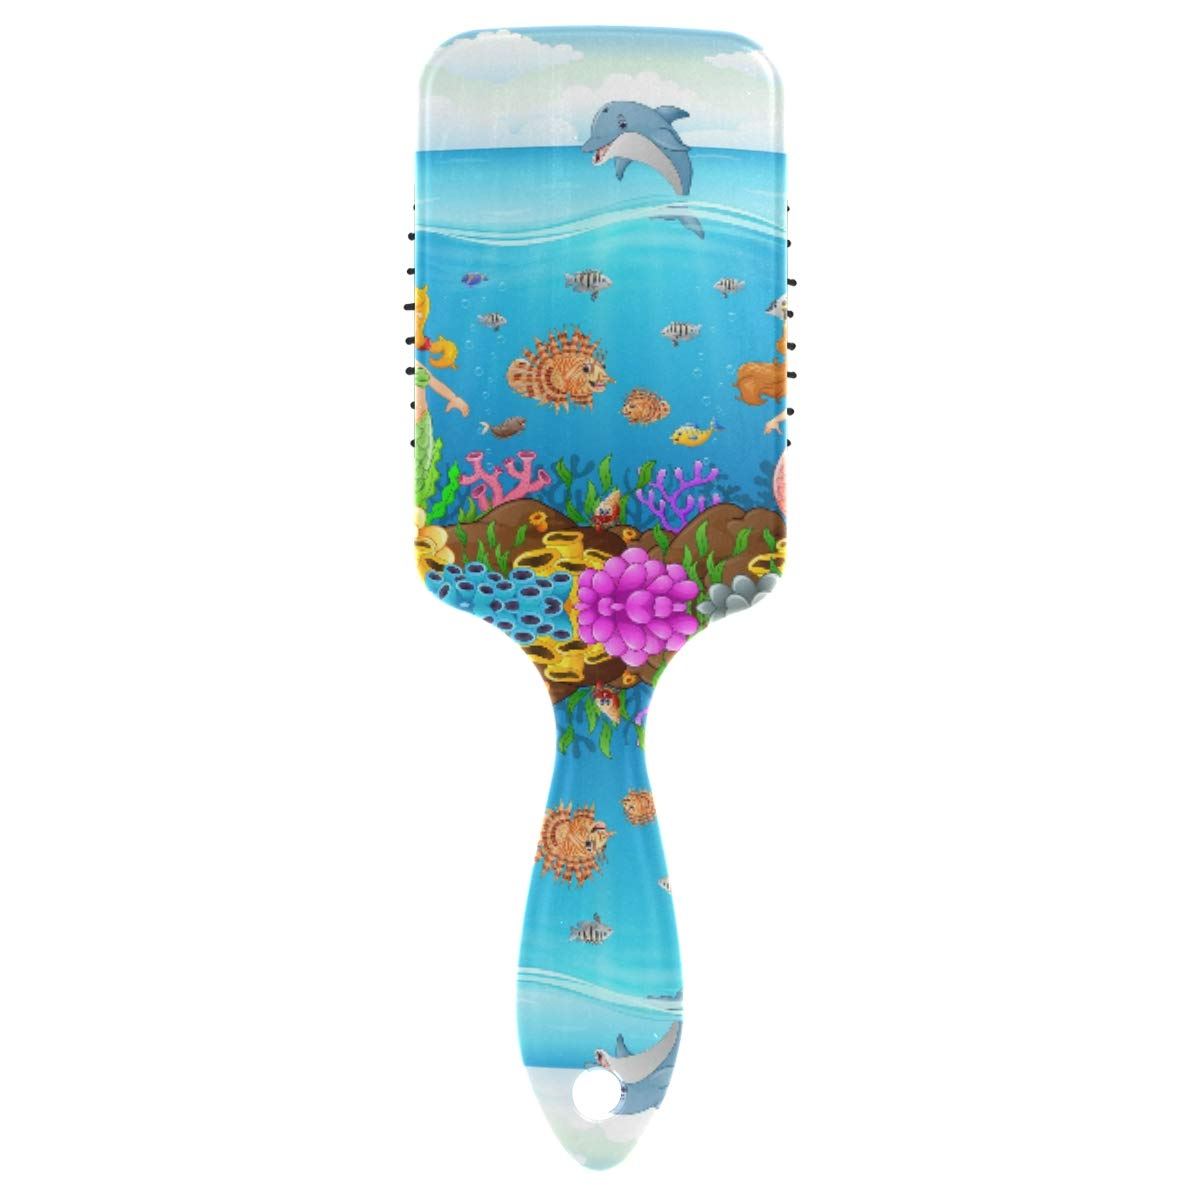 Popular products Linomo Hair Brush Cartoon Mermaid Dolphin New Free Shipping Massage Co Cushion Air